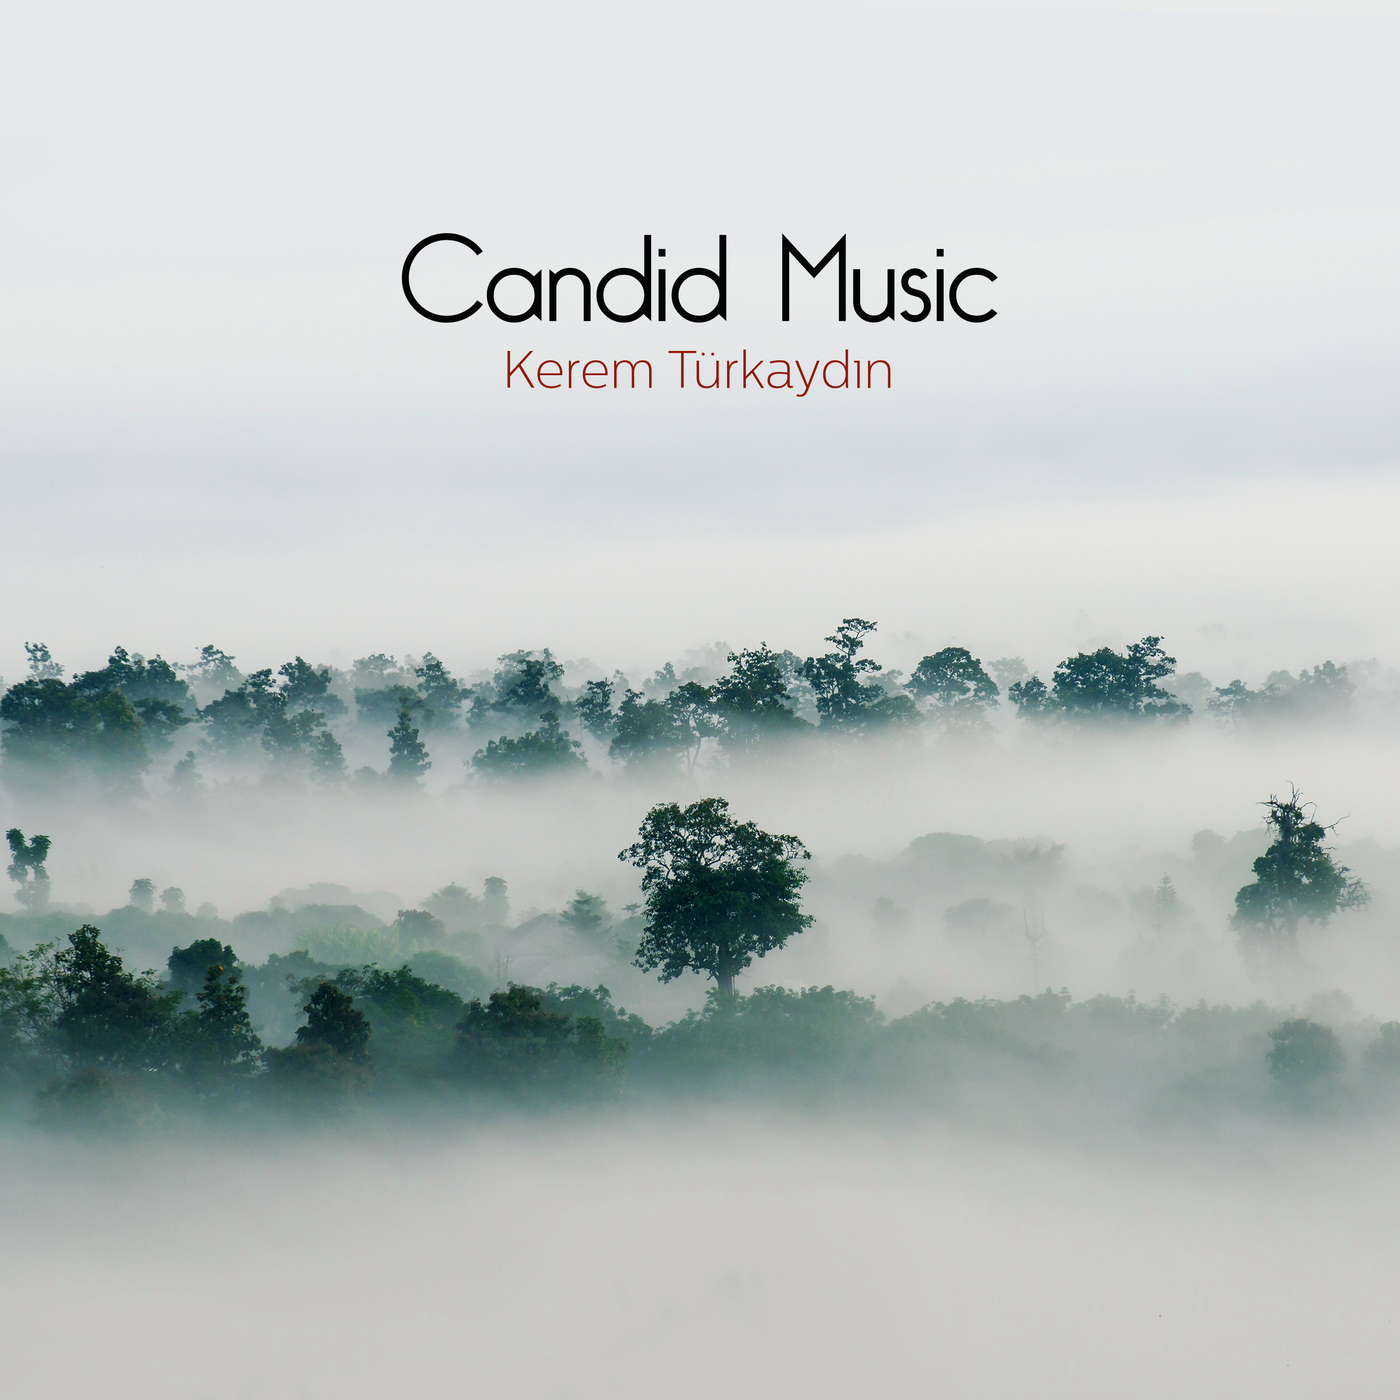 Candid Music - Kerem Turkaydin